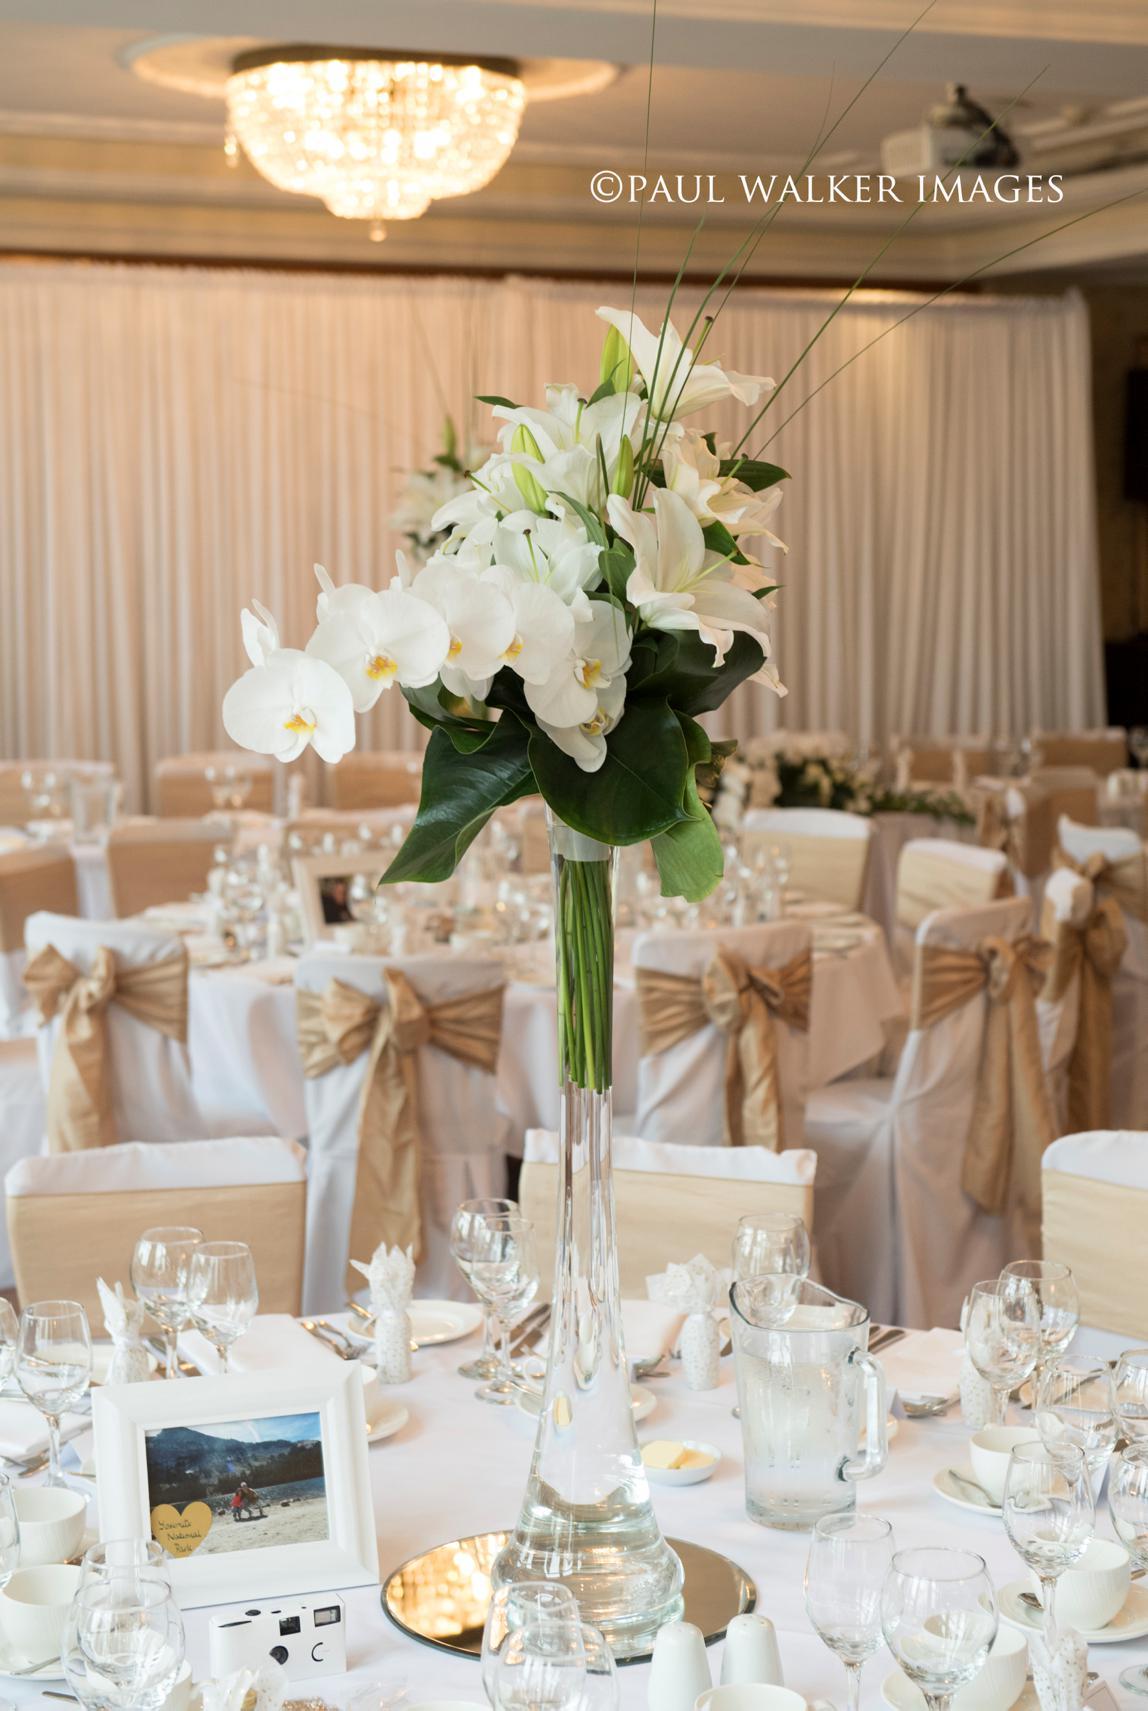 Ayrshire-Wedding-Photographer-Paul-Walker-Images_0008.jpg